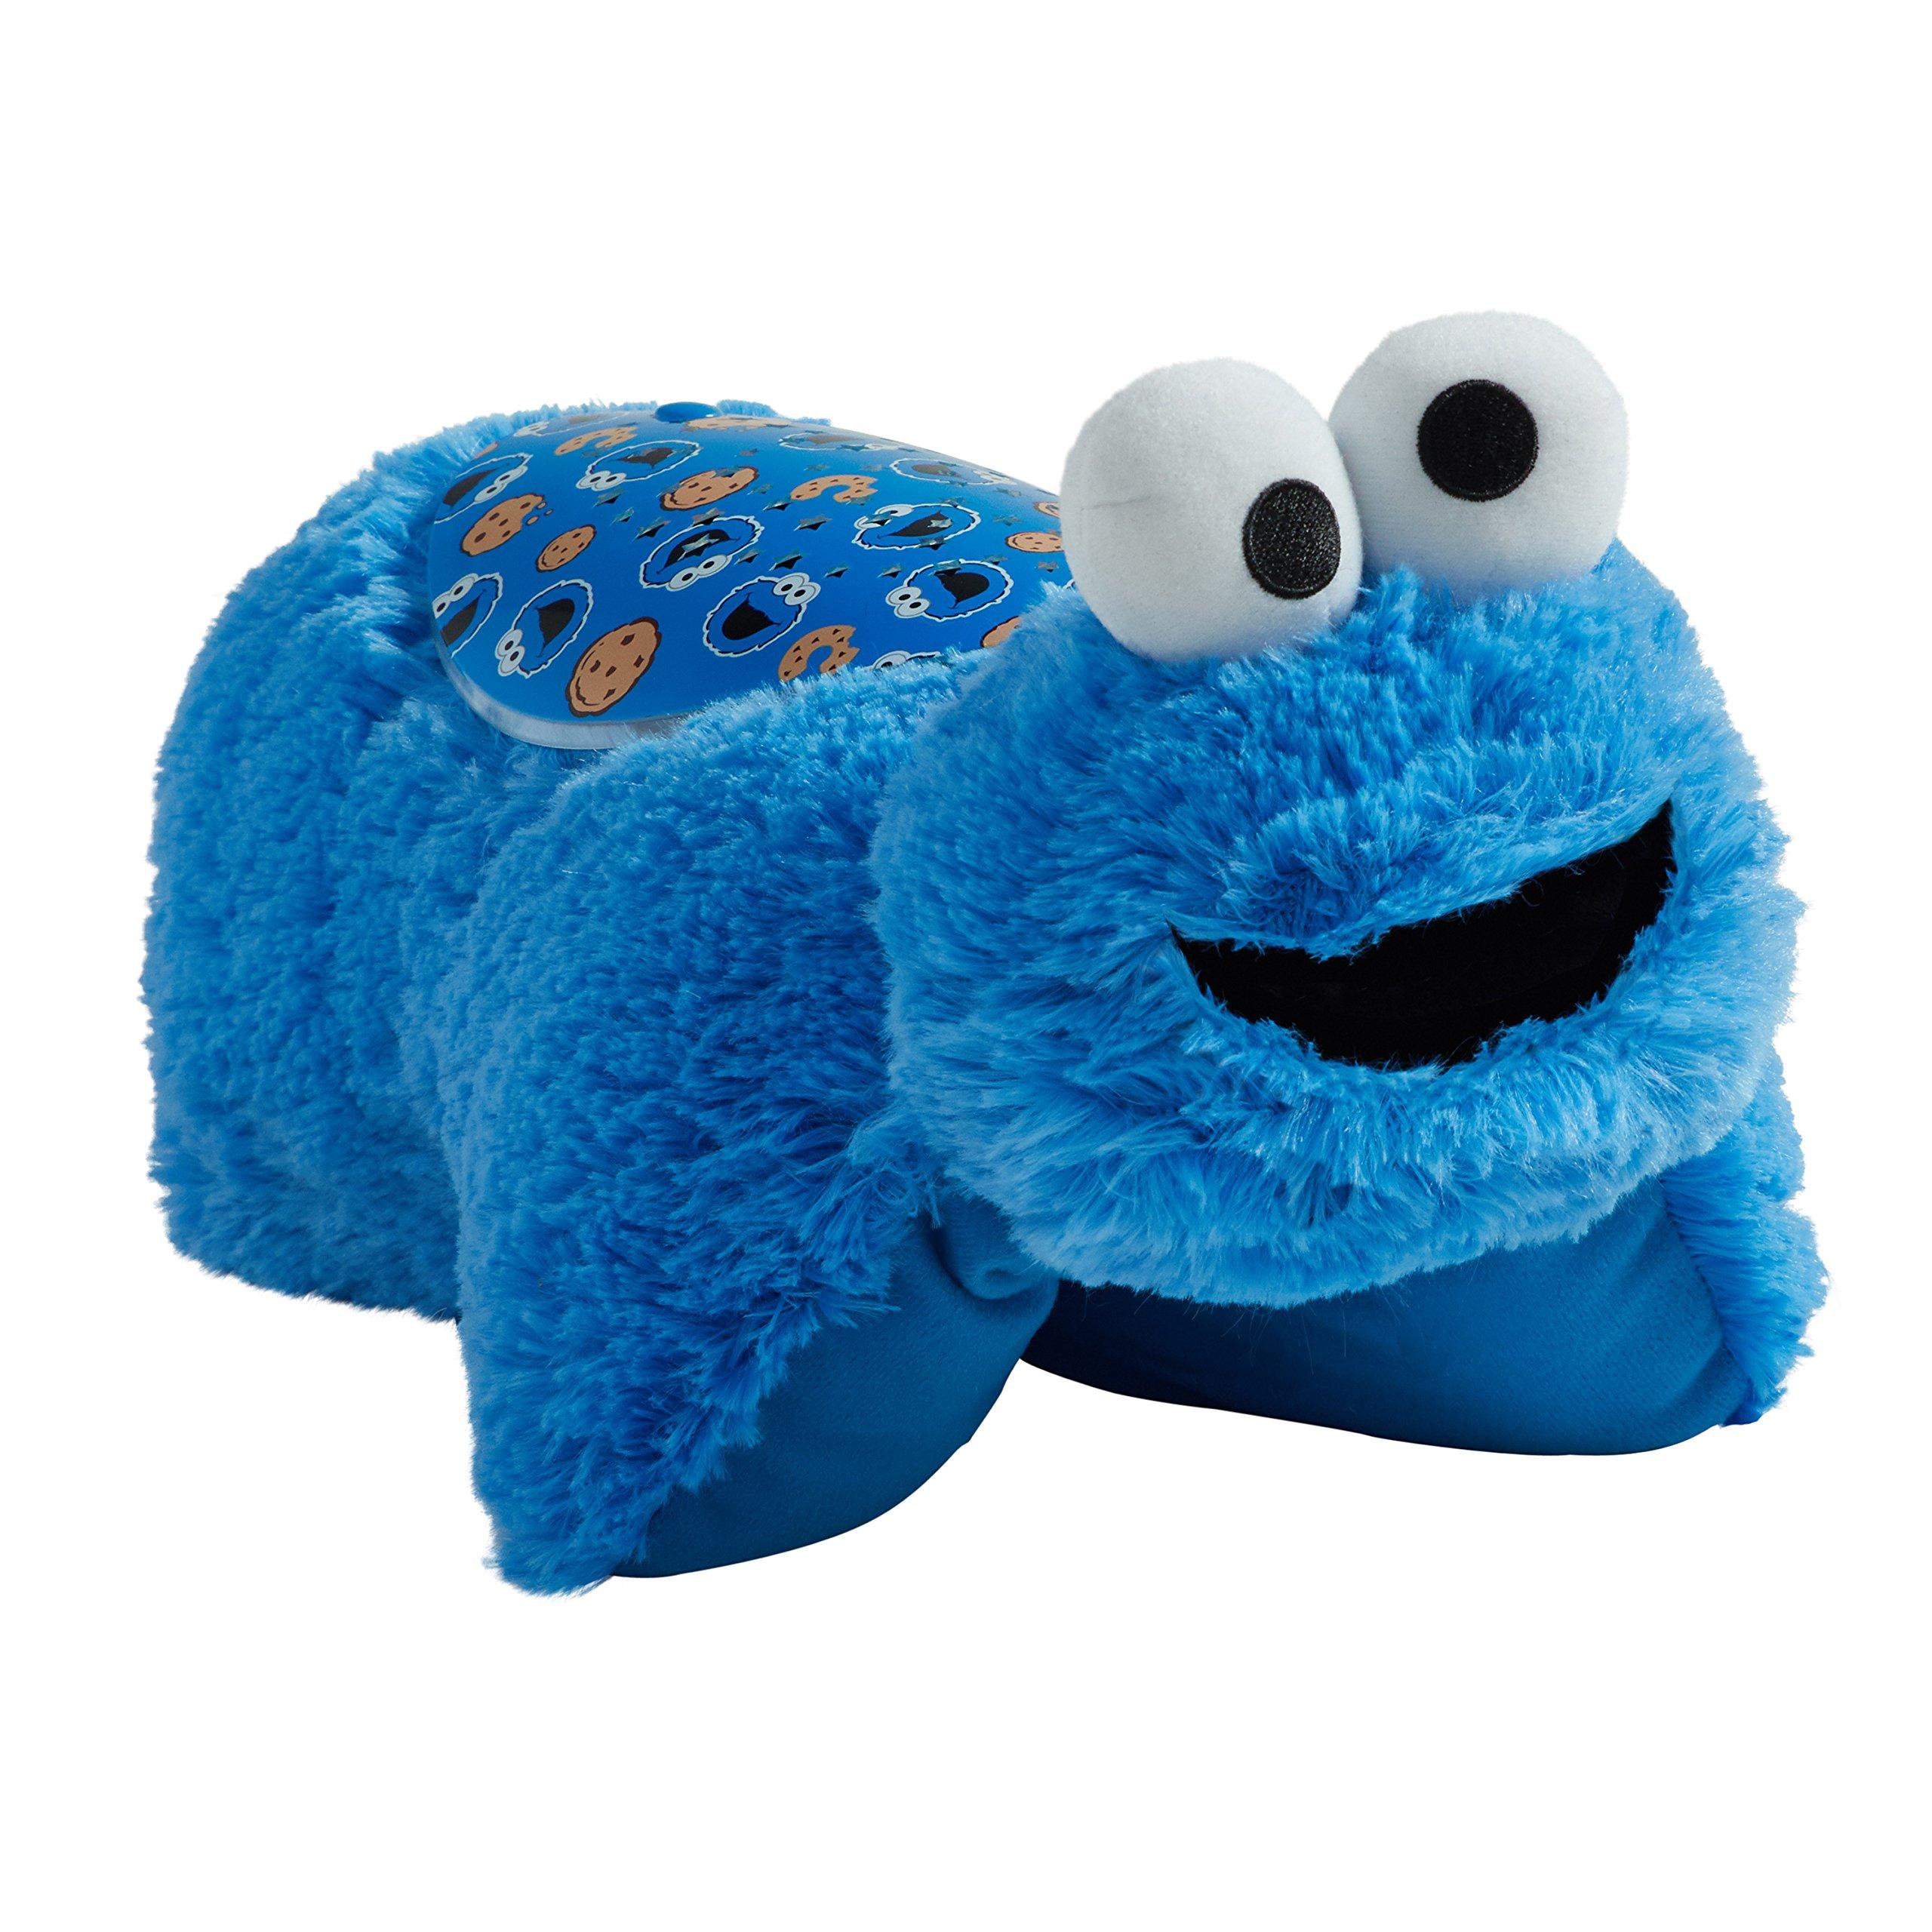 Pillow Pets Cookie Monster Sleeptime Lite - Sesame Street Plush by Pillow Pets